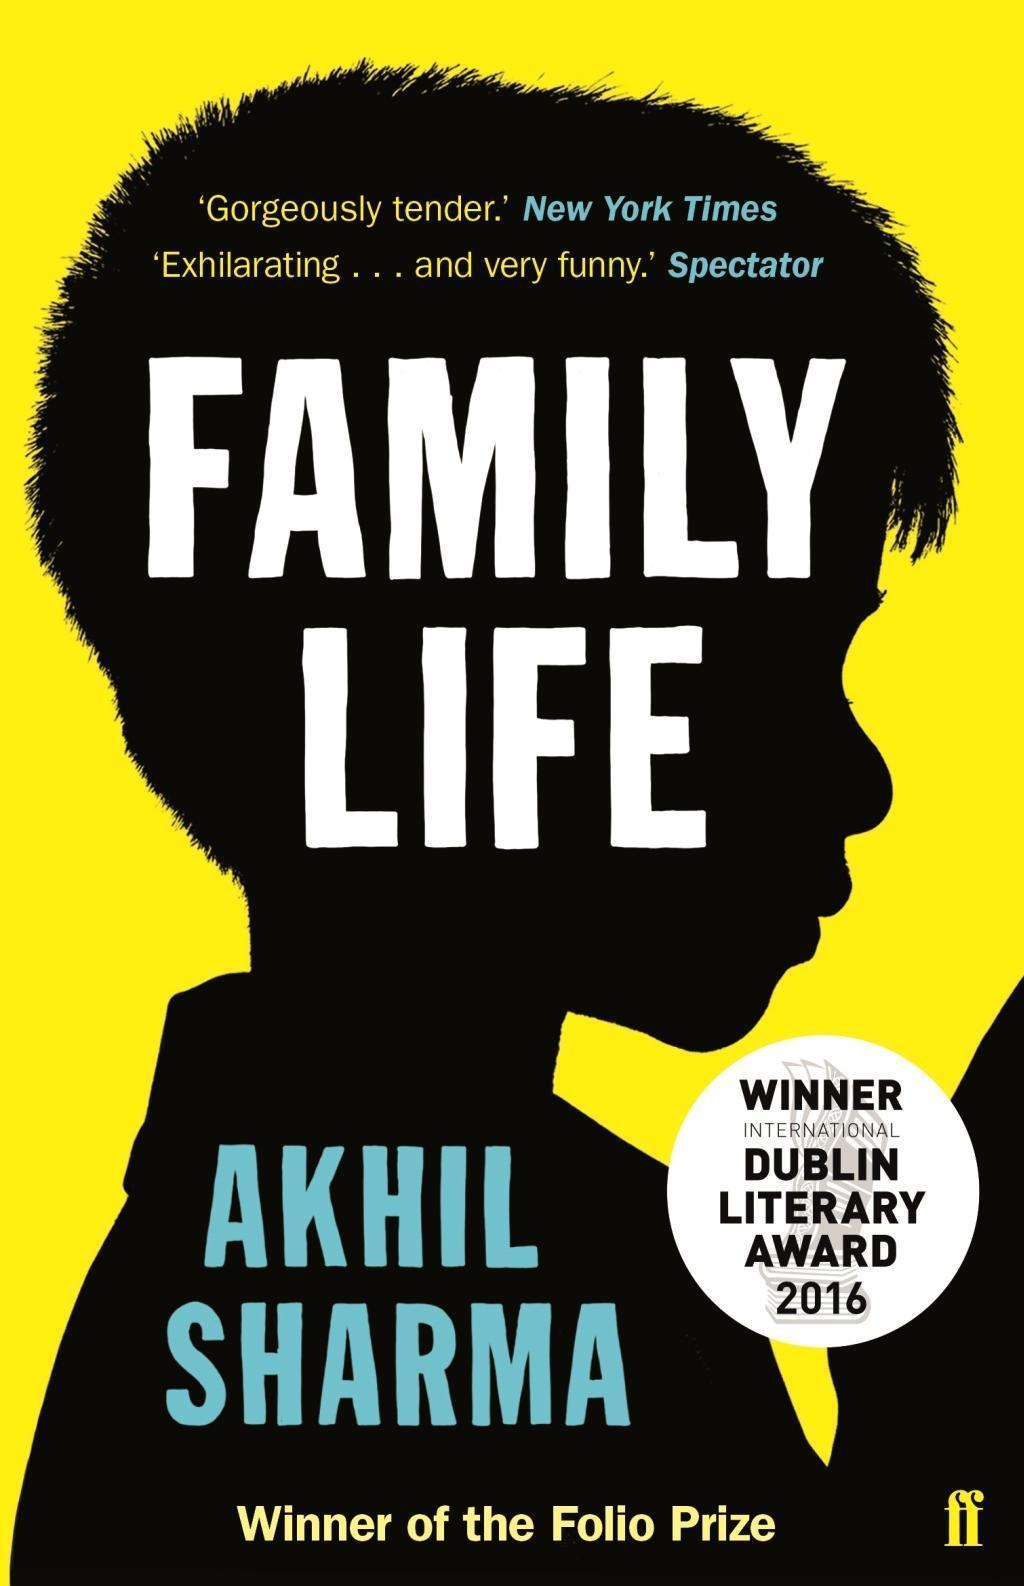 Family-Life-Akhil-Sharma